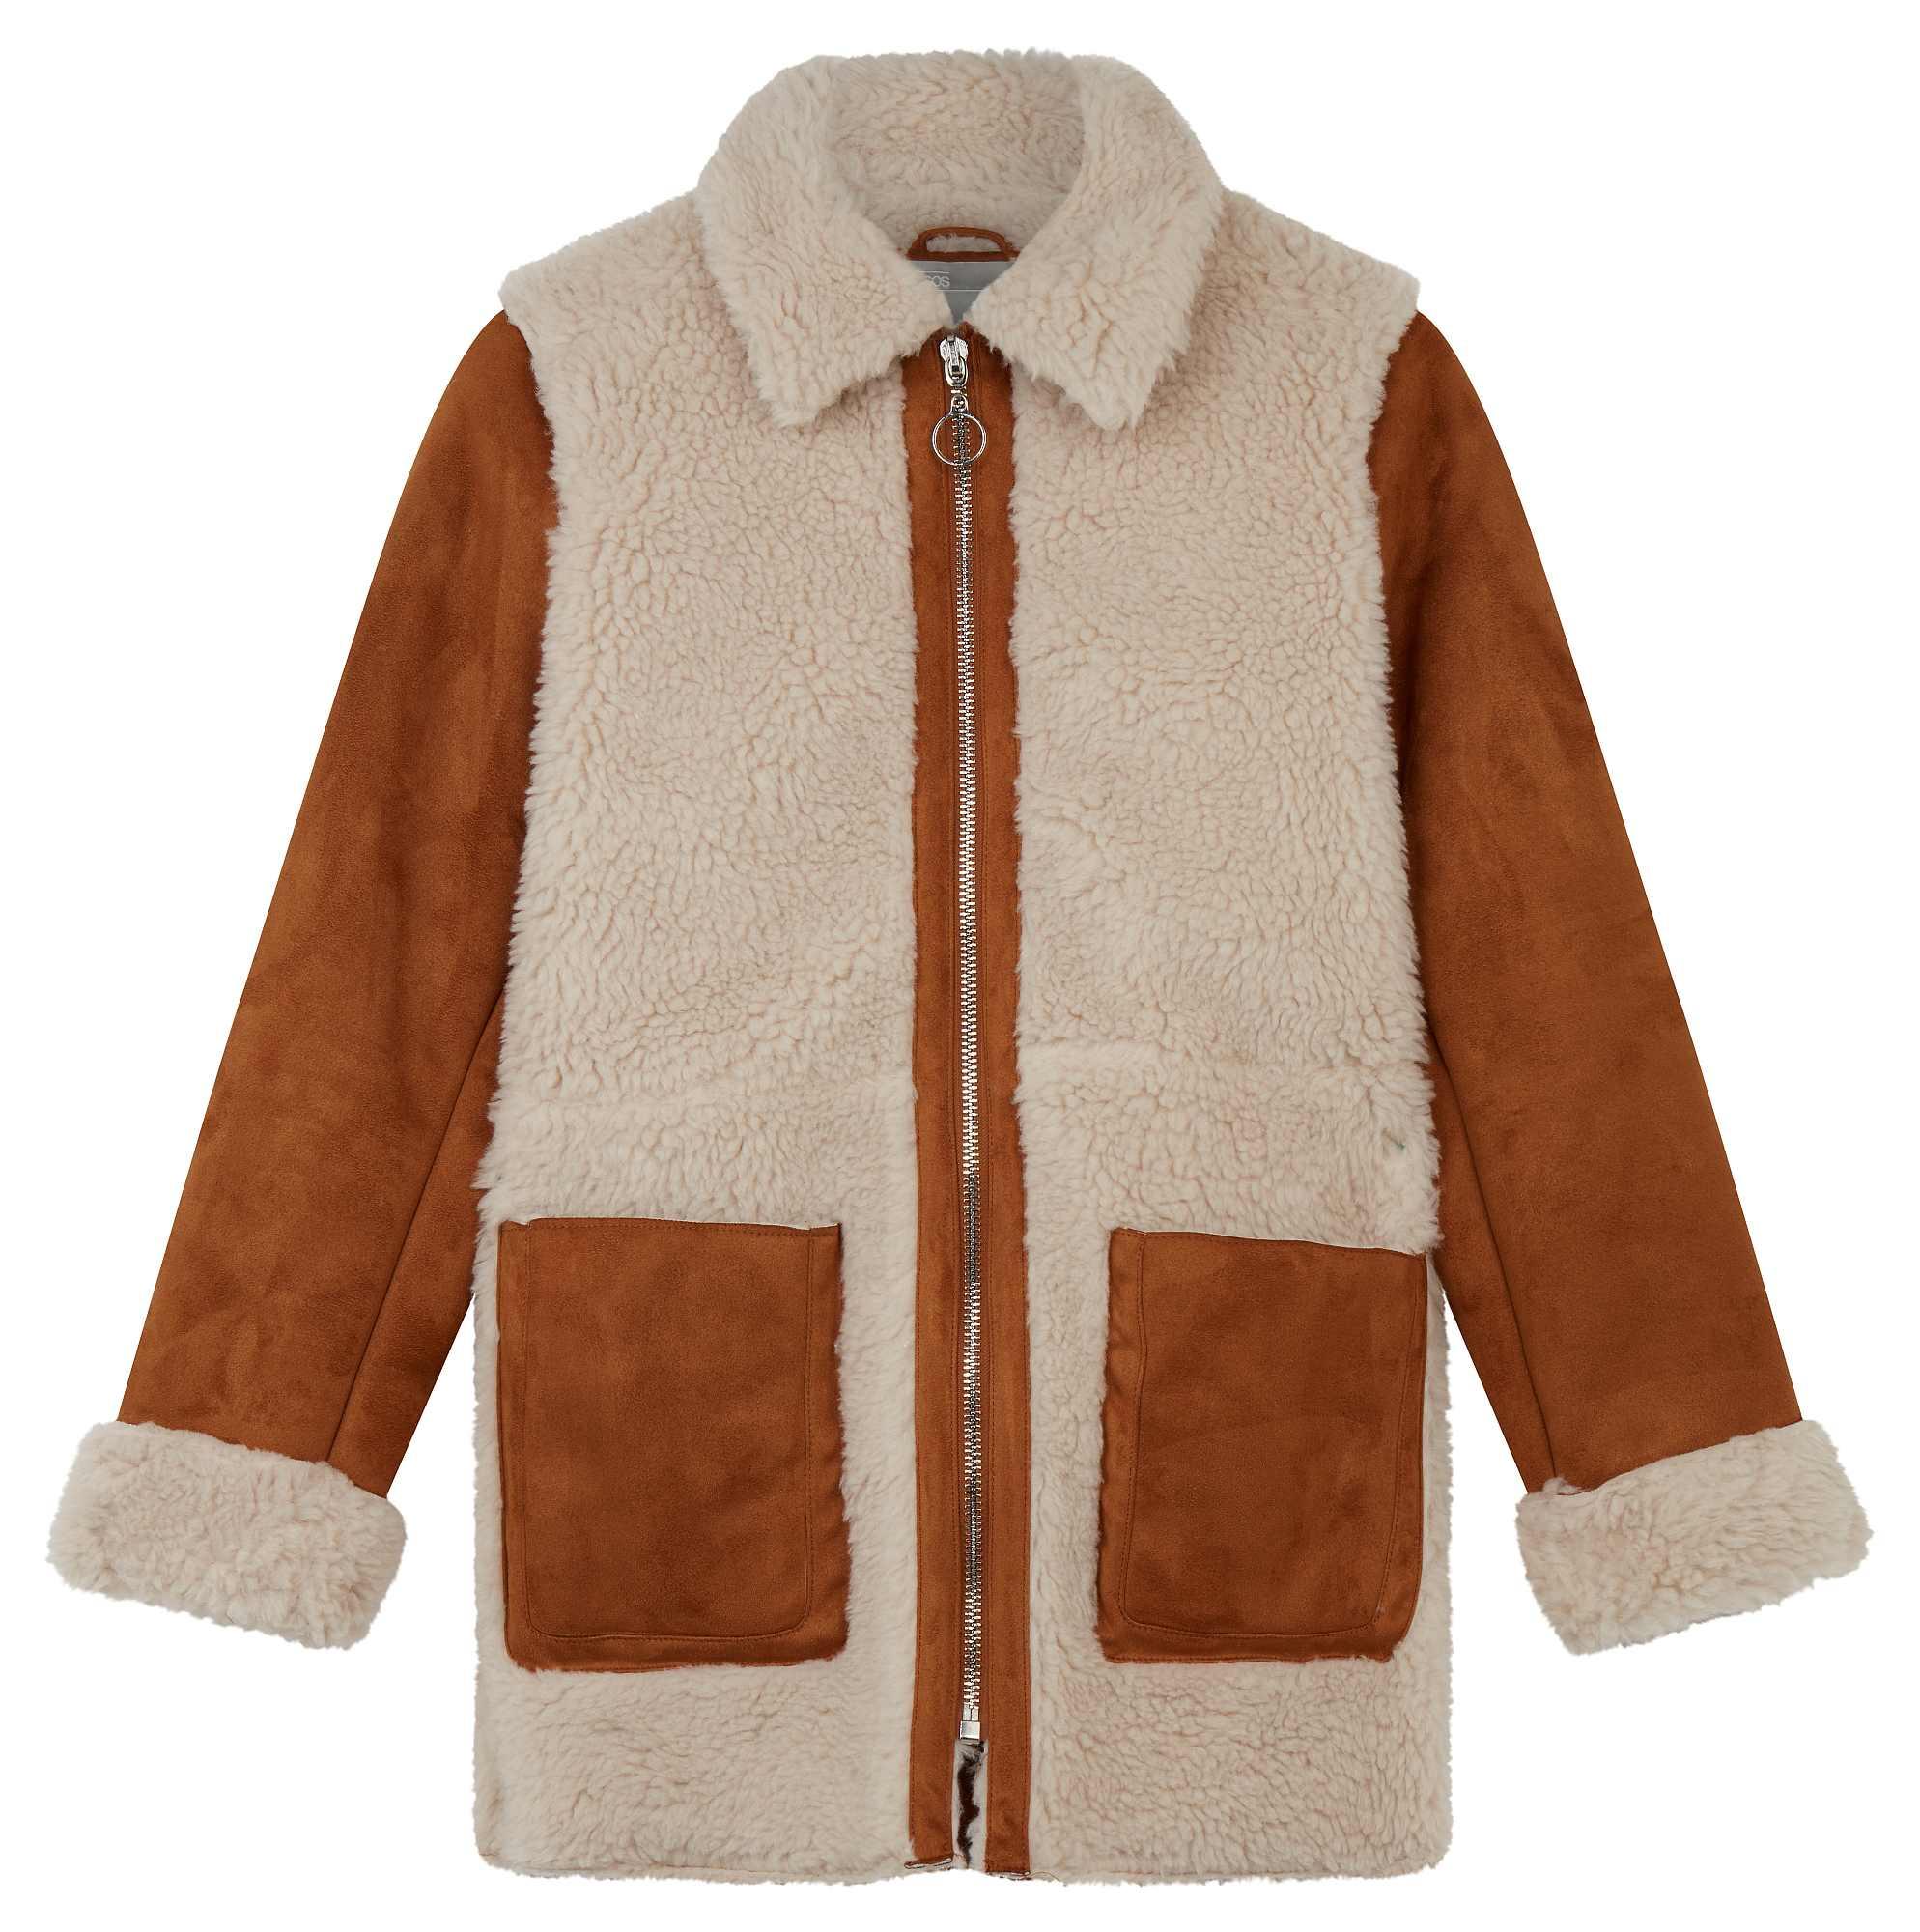 ASOS Faux Shearling Coat (ASOS/PA)